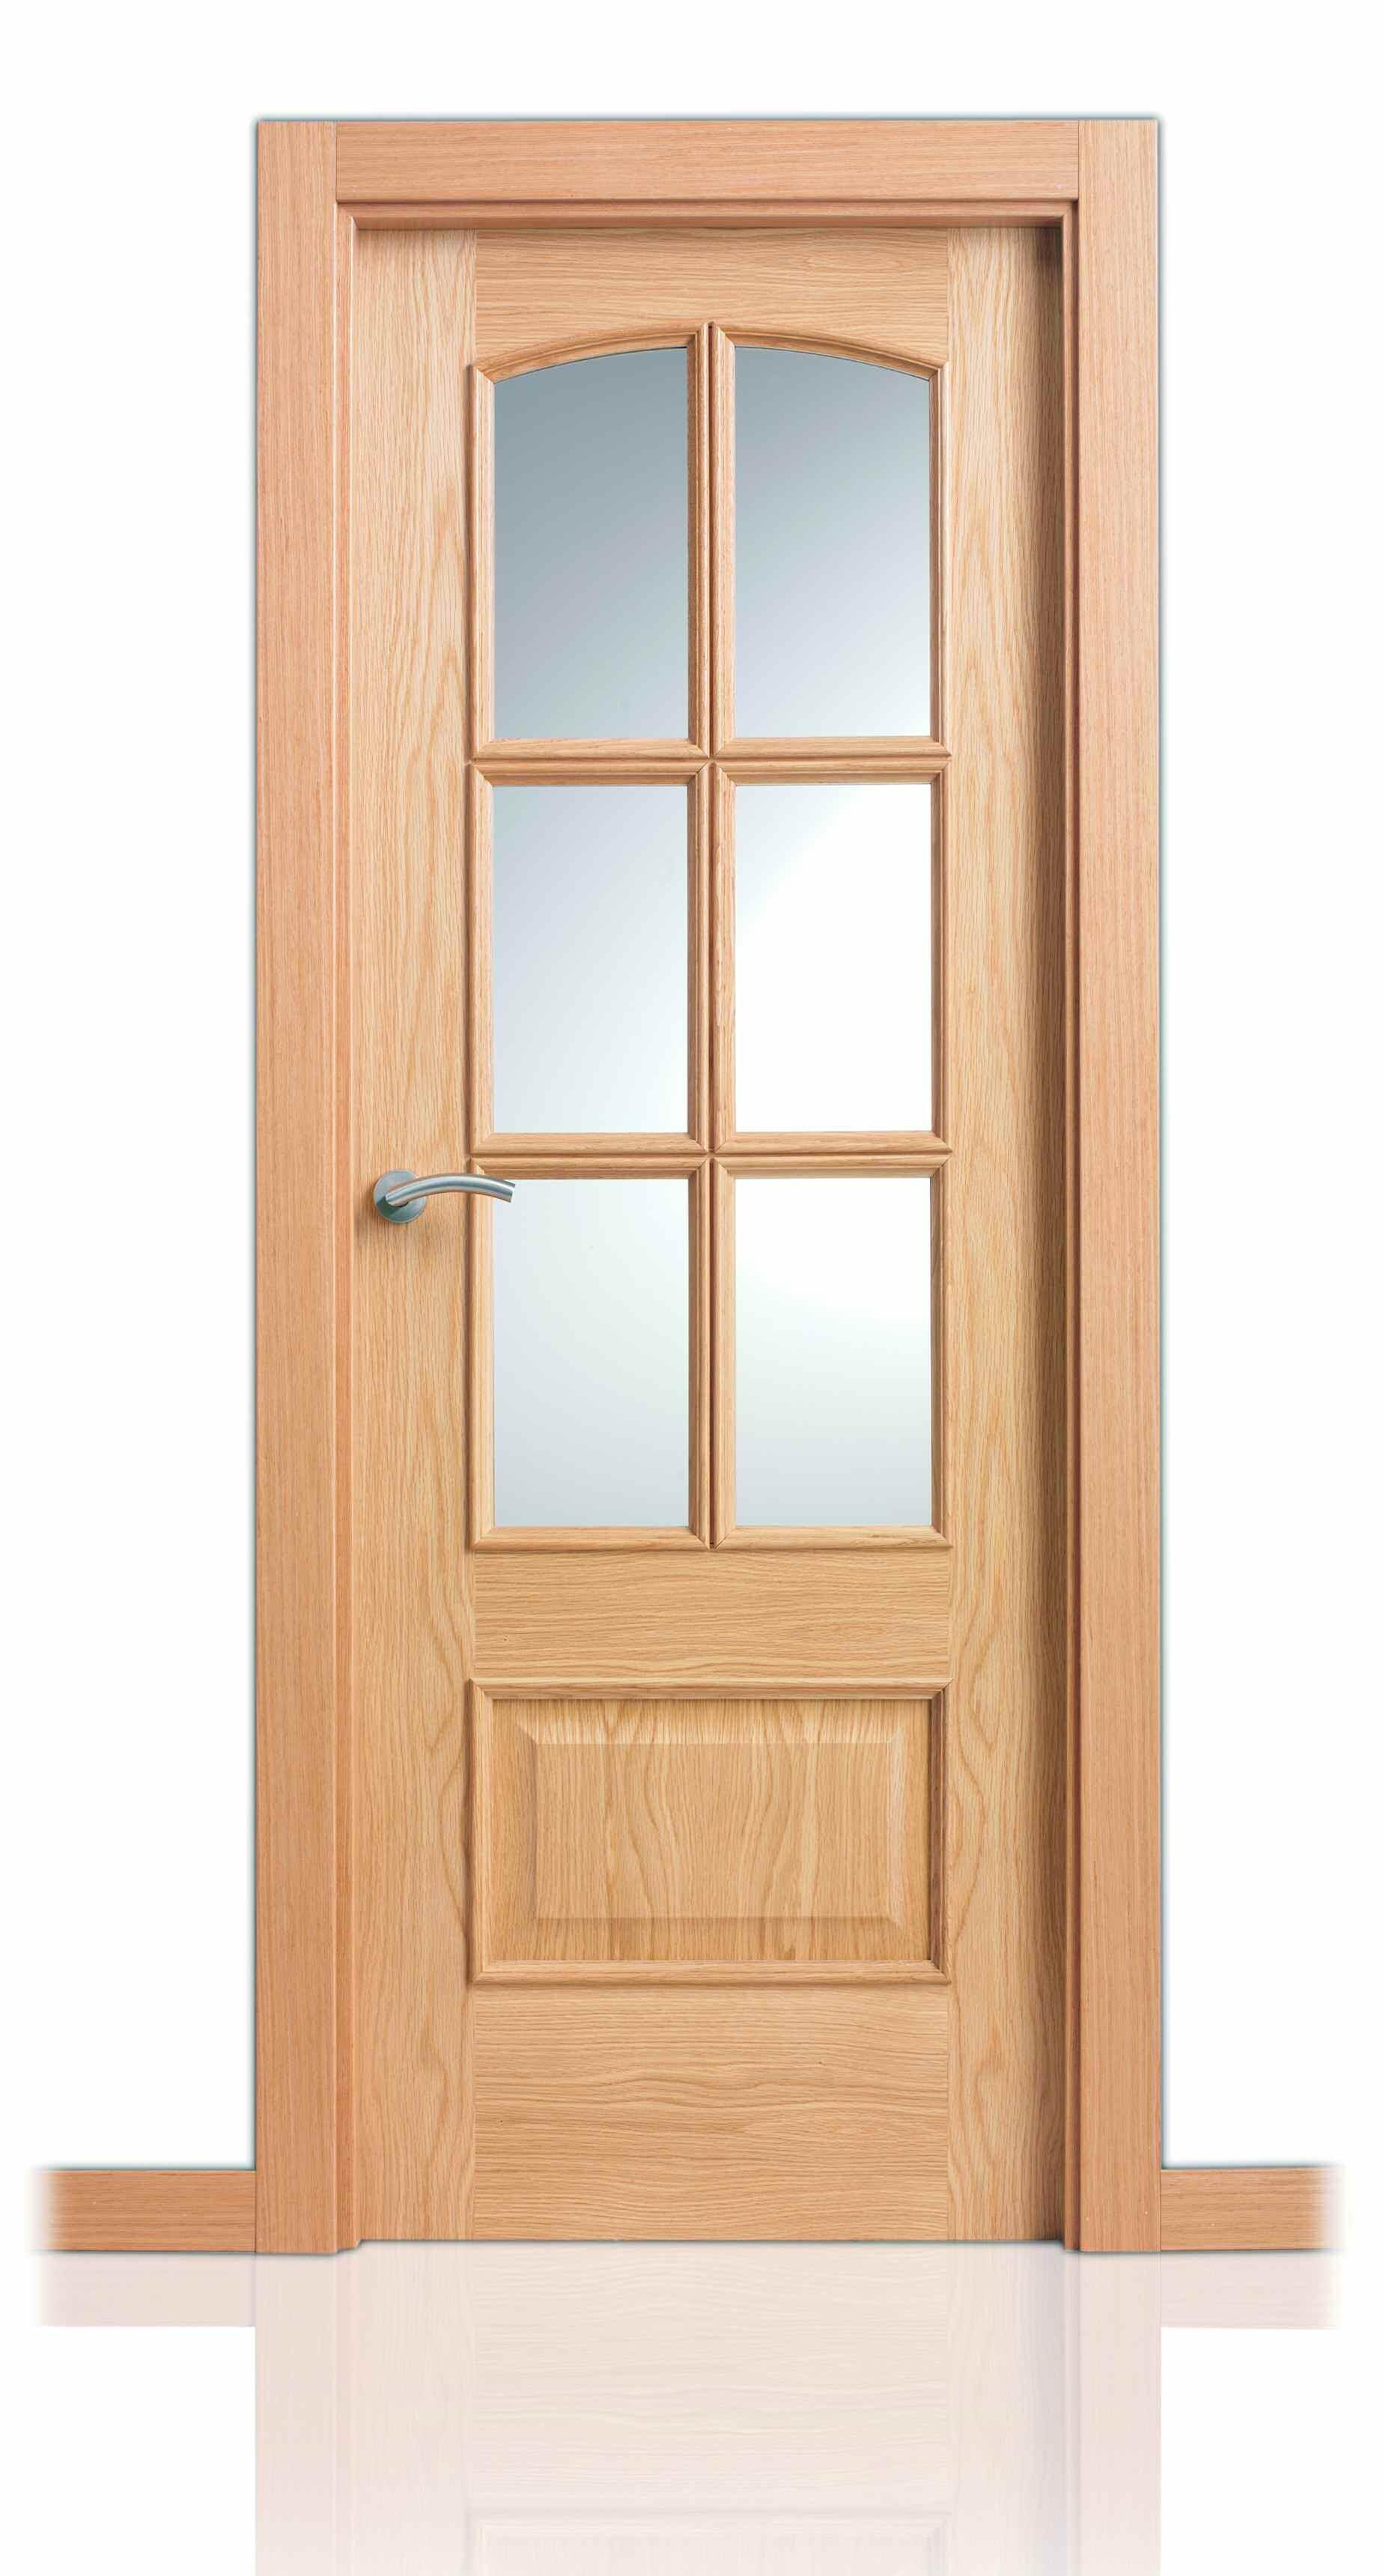 Puerta serie clasica curva tm decoraciones mabel for Catalogo de puertas de madera para interiores